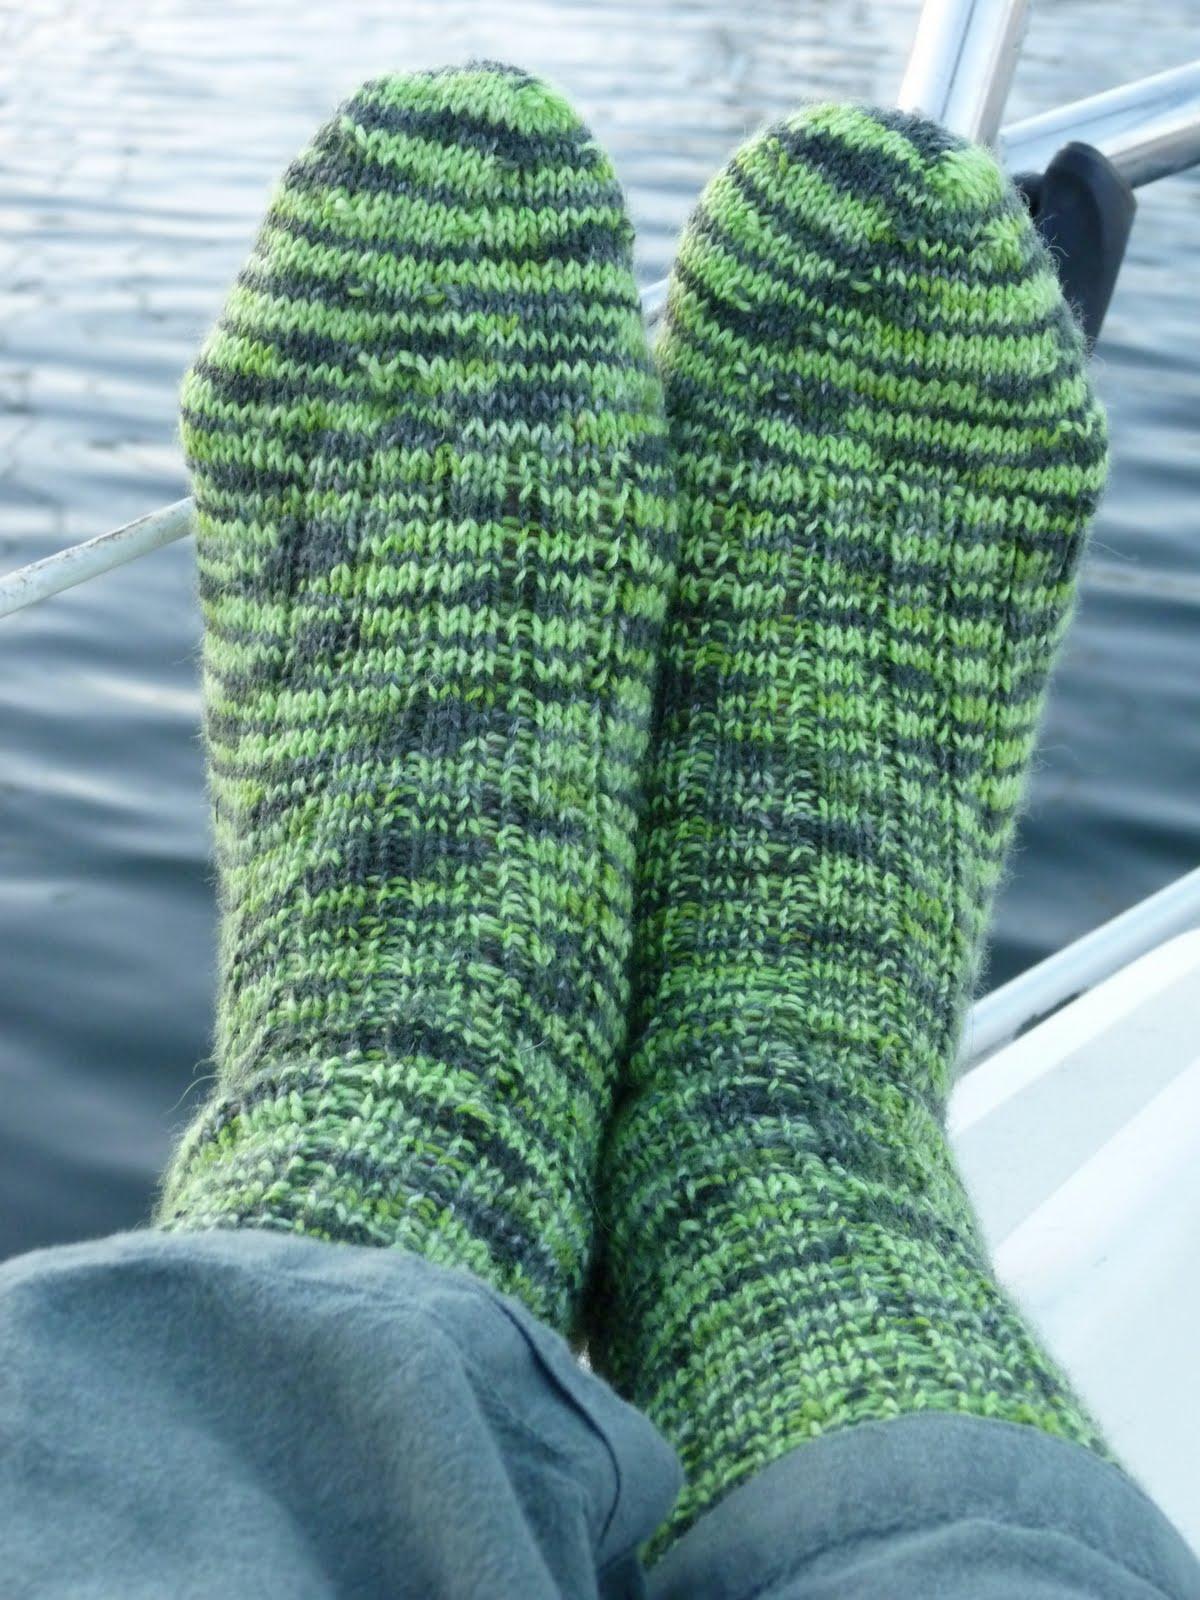 Knitting Vintage Socks Nancy Bush : Bewitched fingers socks new yarn